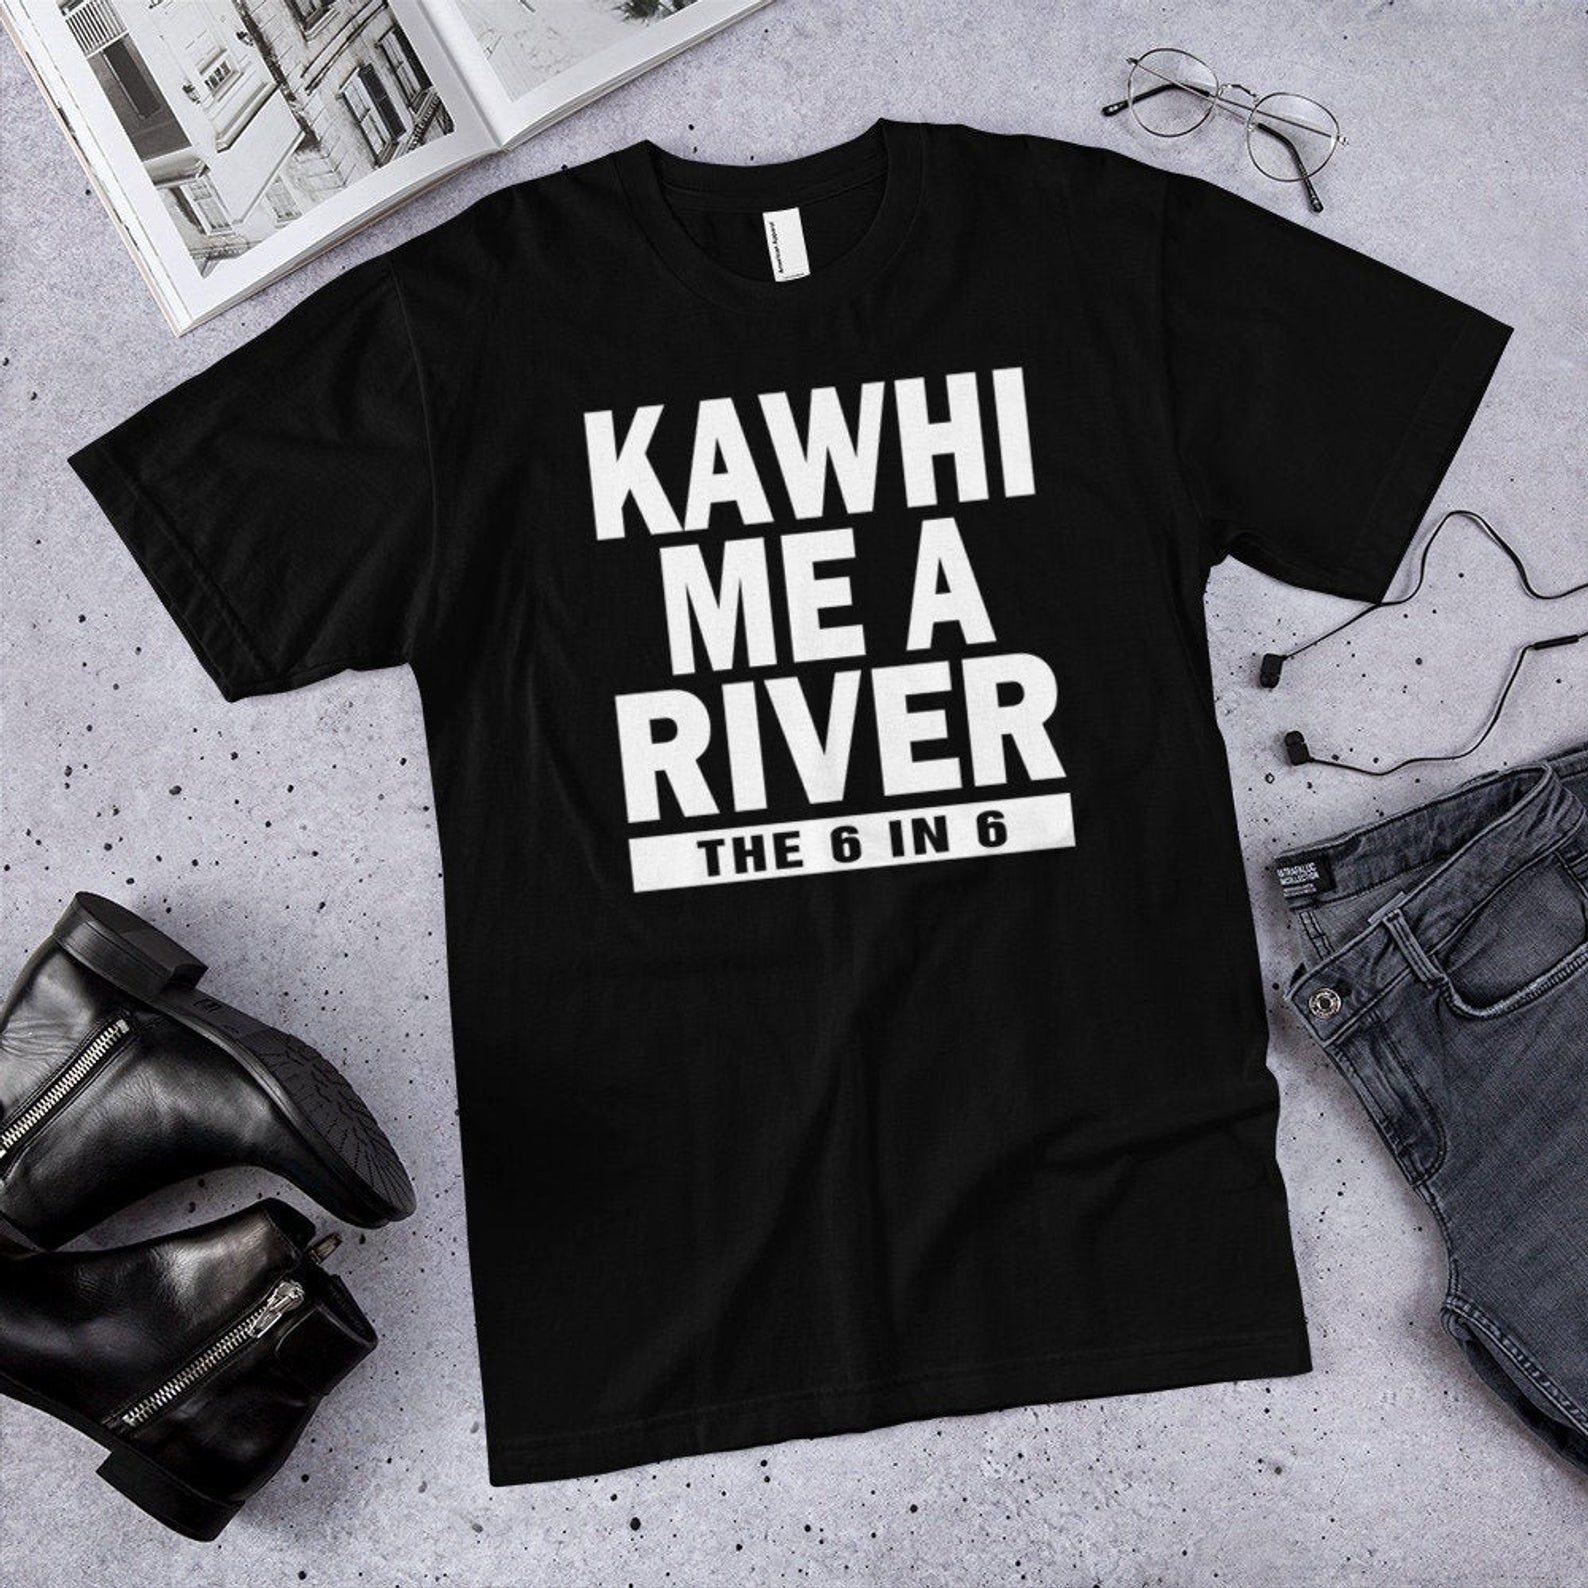 best service af059 b64e3 Kawhi me a river the 6 in 6 Toronto raptors shirt , Kawhi Leonard shirt